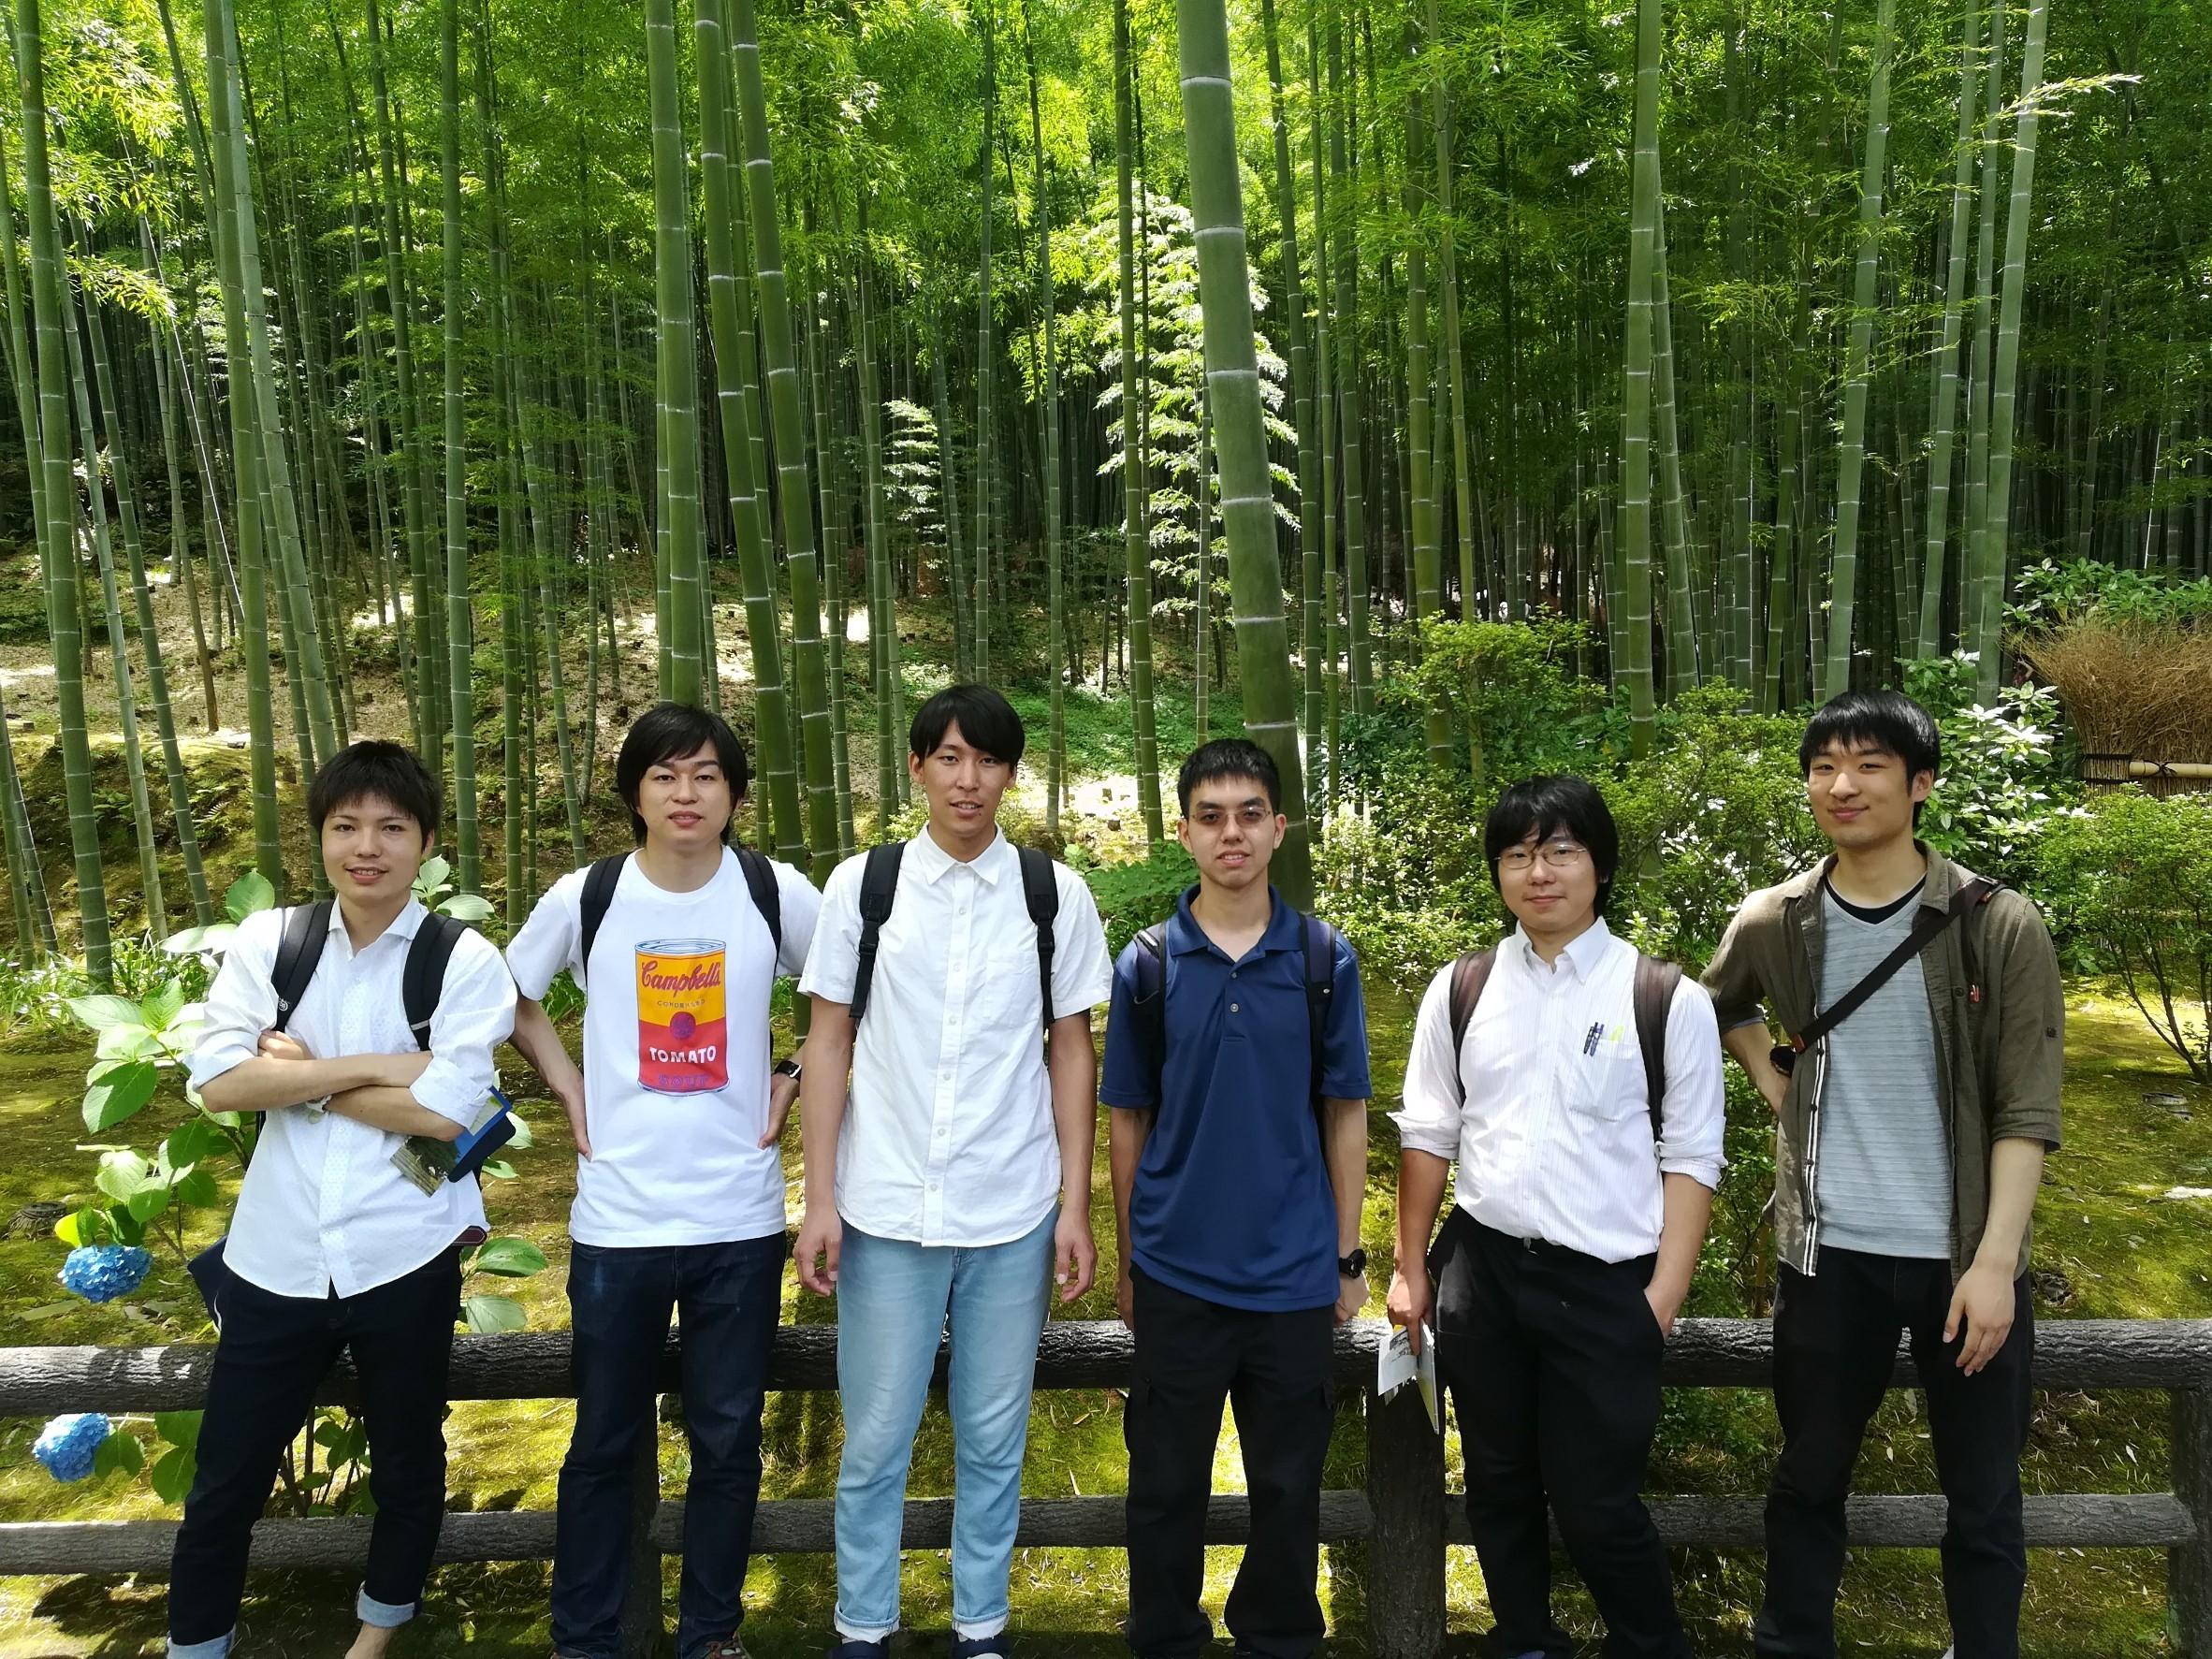 index.php?plugin=ref&page=Solid%20State%20Spectroscopy%20Group&src=Arashiyama_180722_0047.jpg